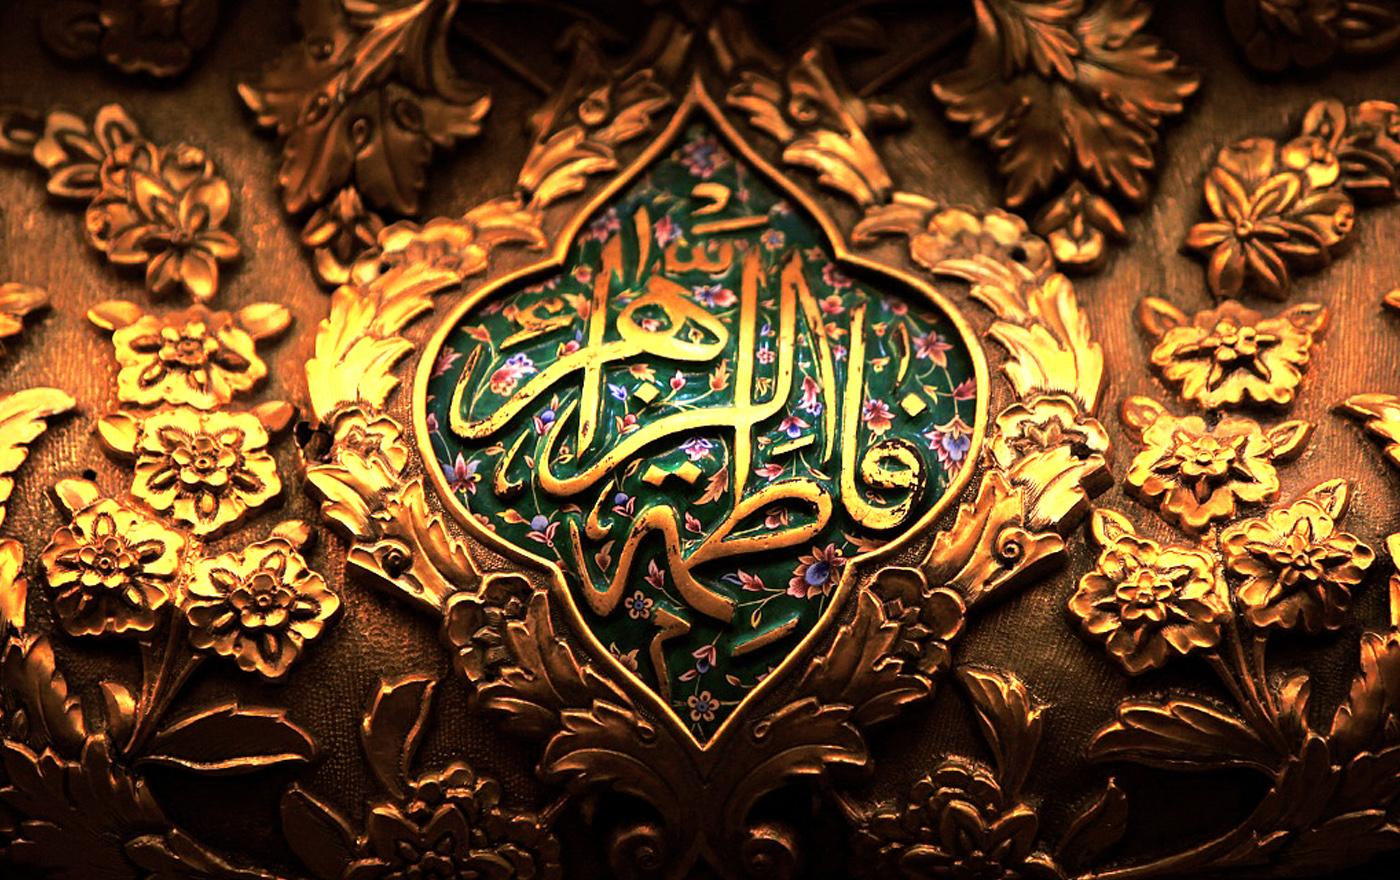 ترجمه زیارتنامه حضرت فاطمه زهرا سلام الله علیها